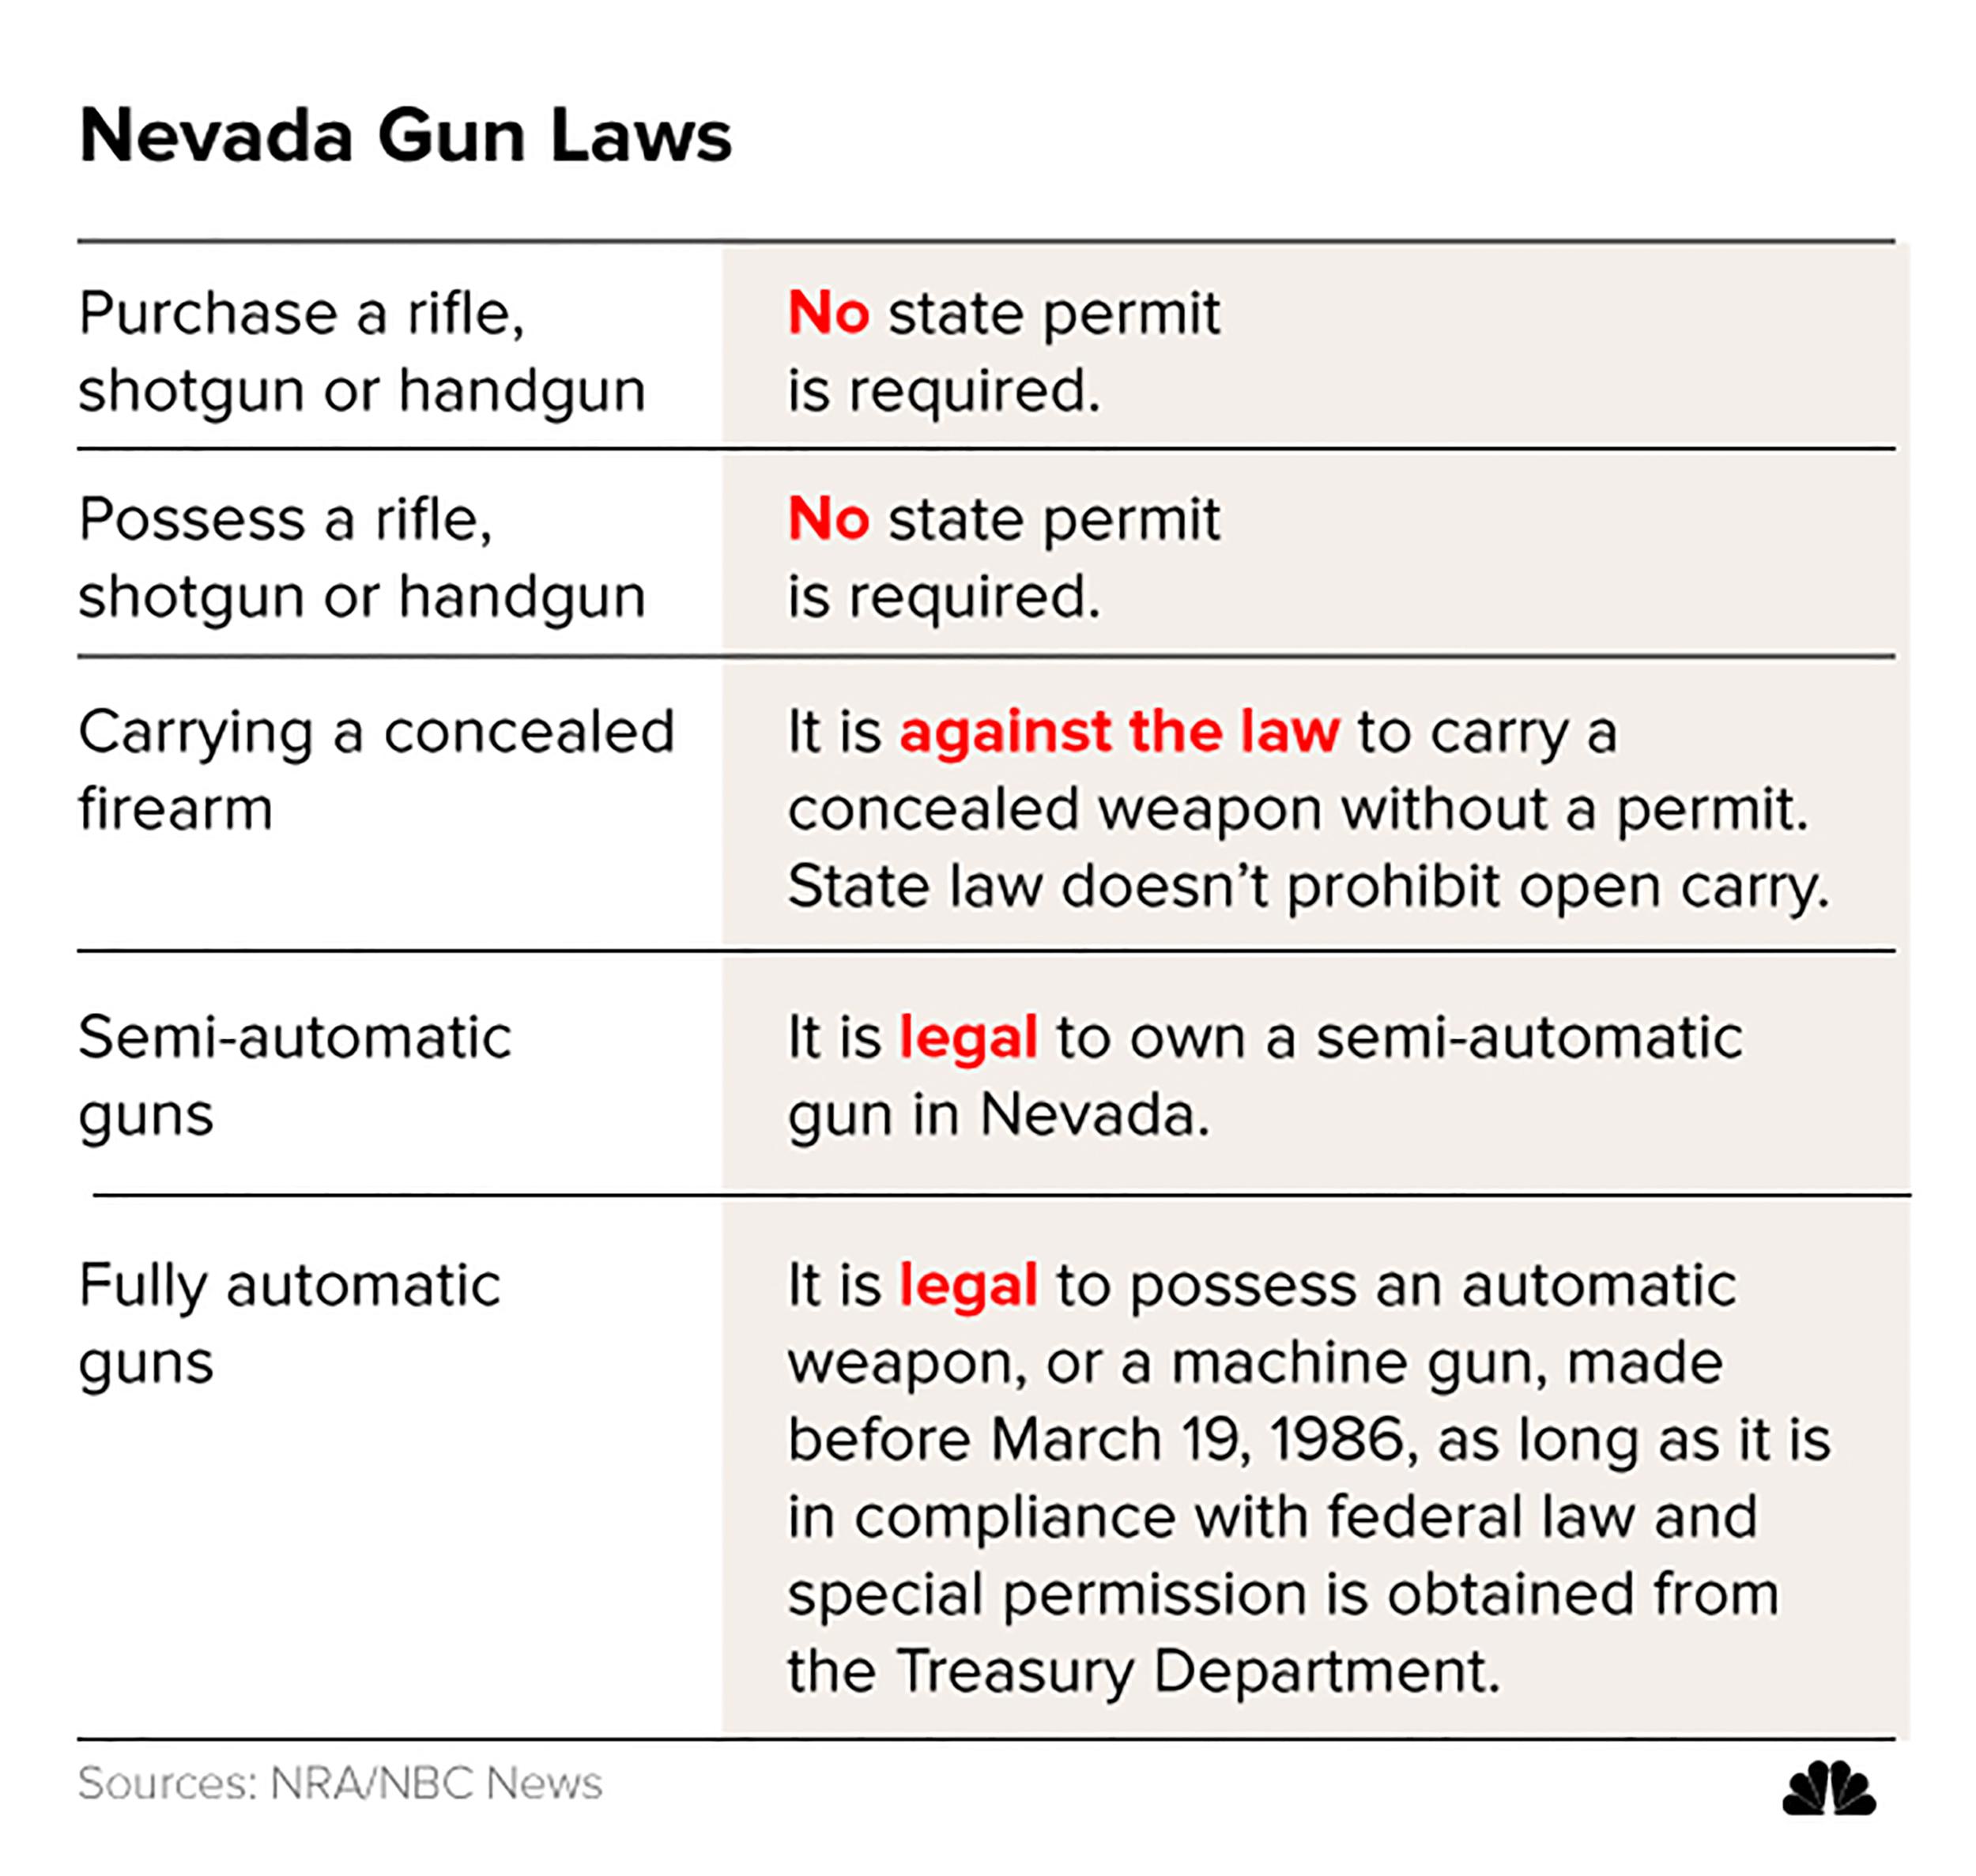 Image: Nevada Gun Laws